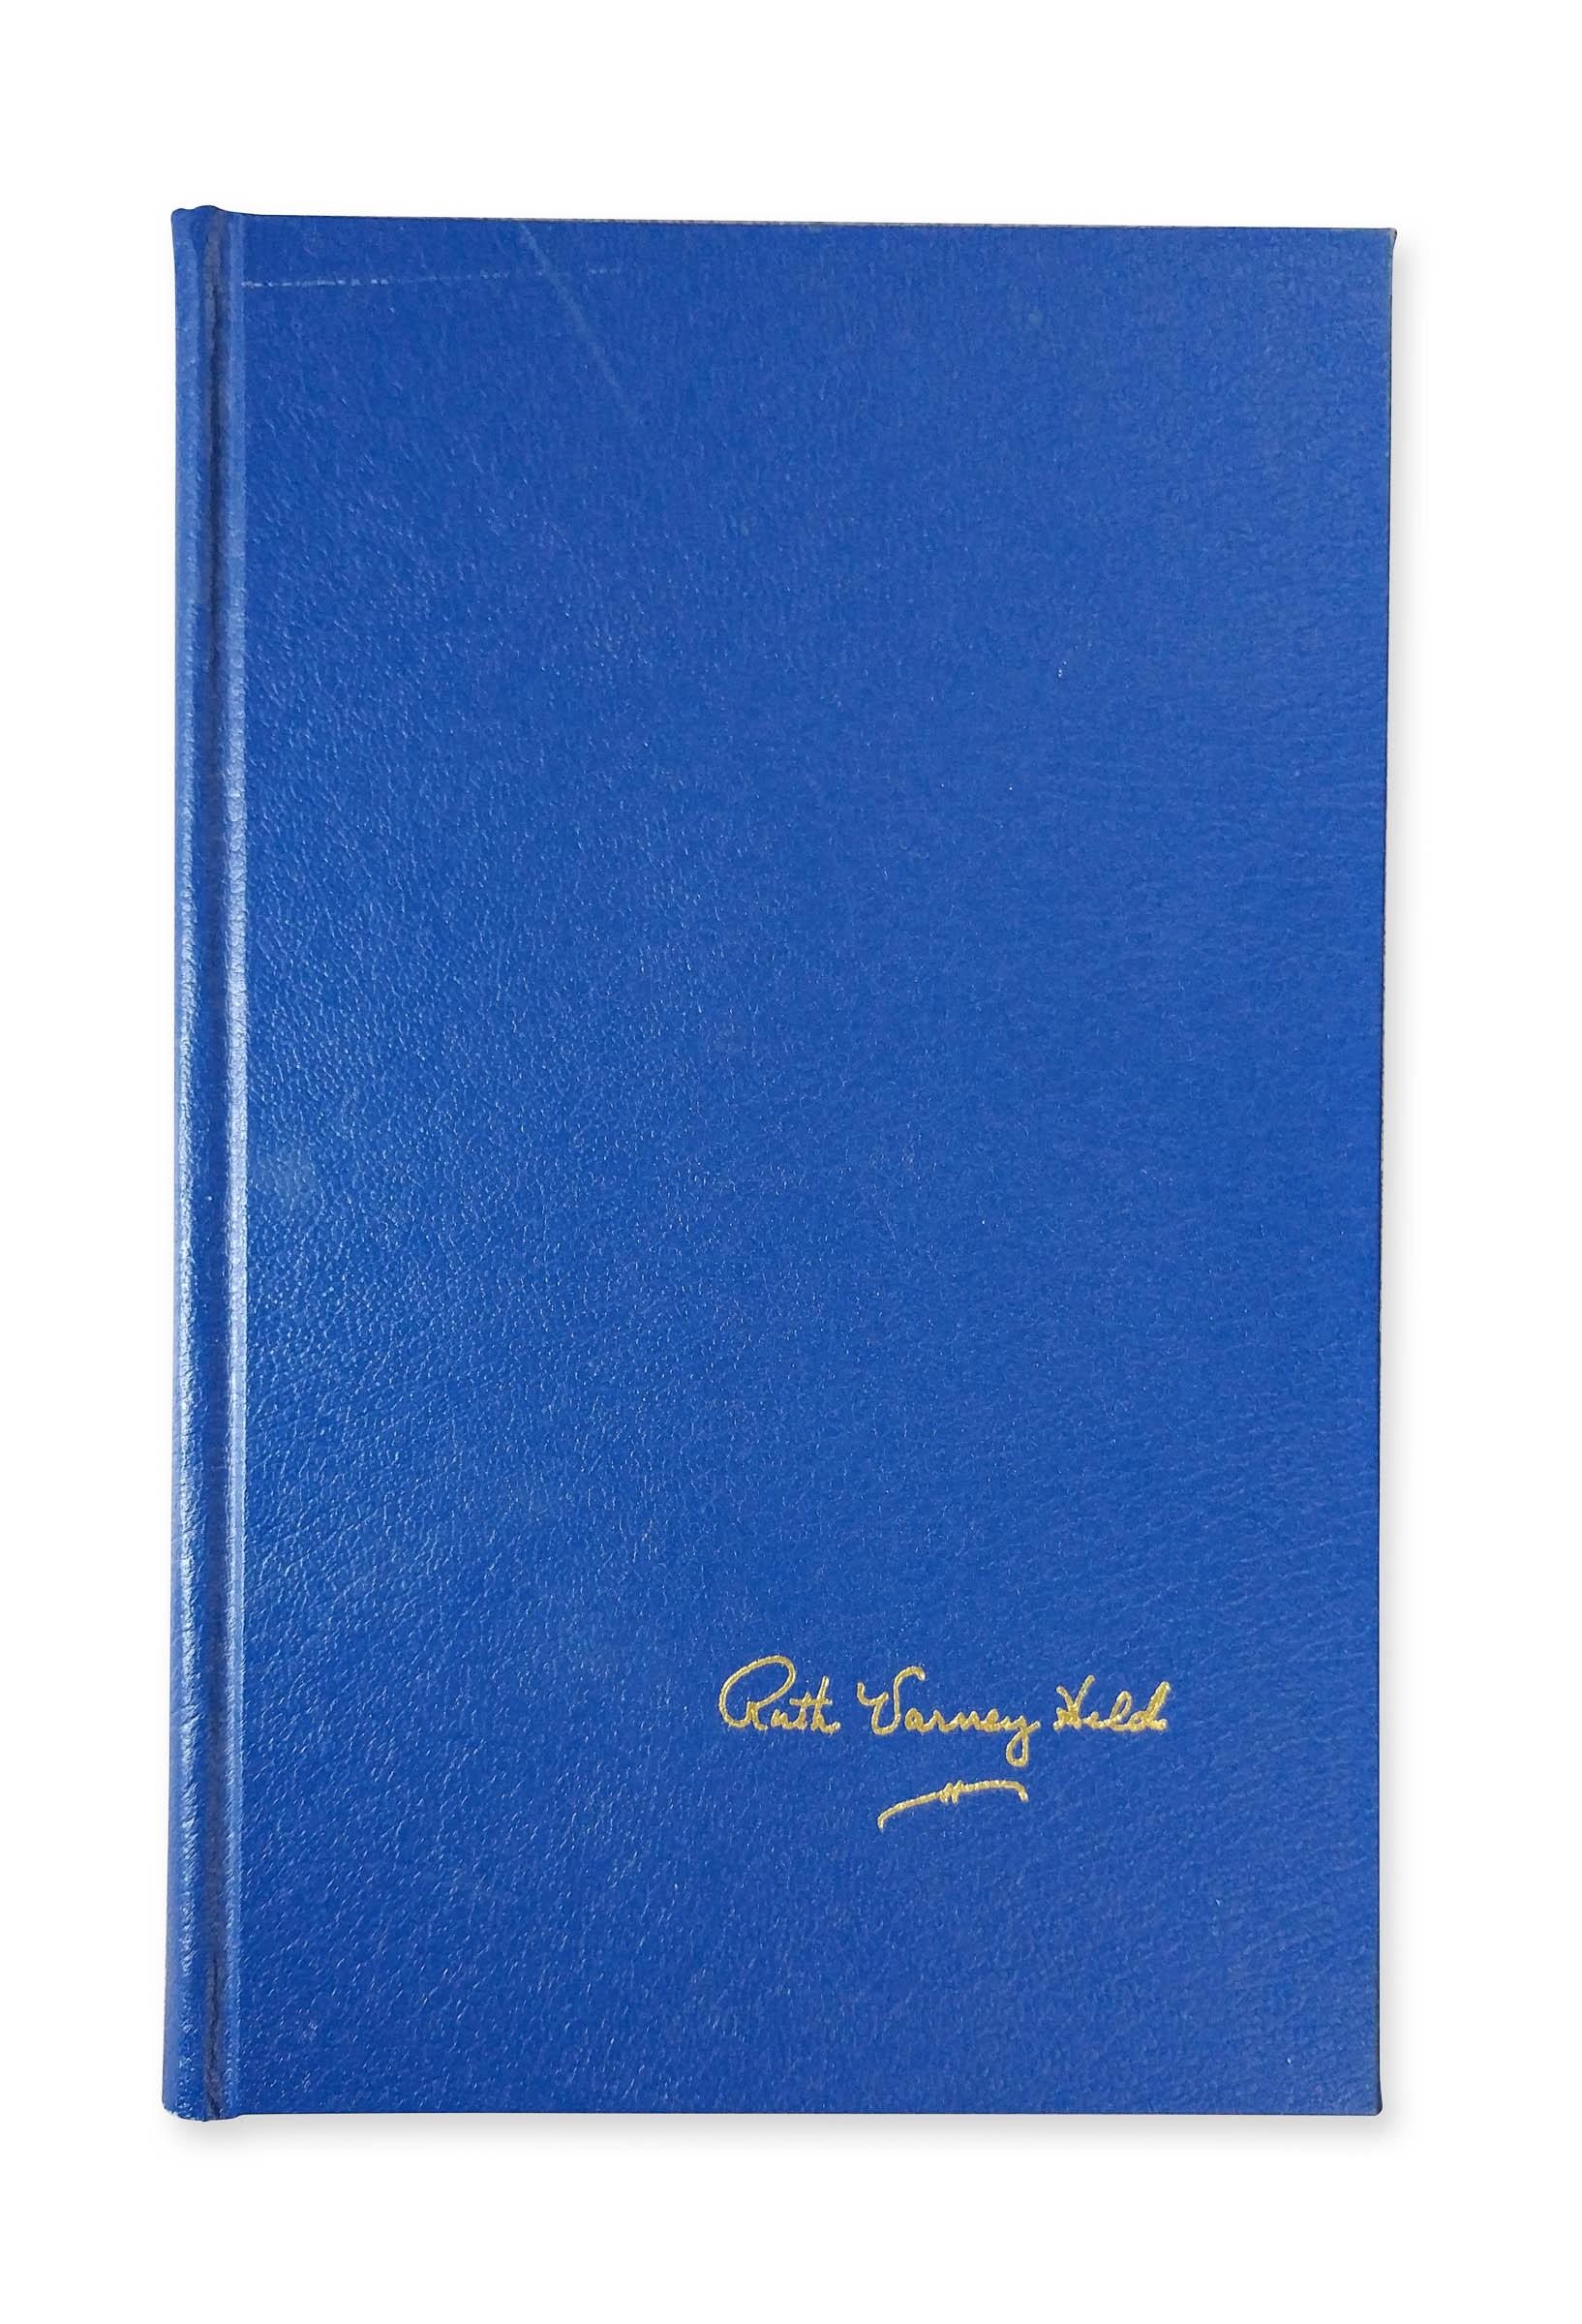 Ocean Beach Product: Beach Town by Ruth Varney Held (dark blue edition)